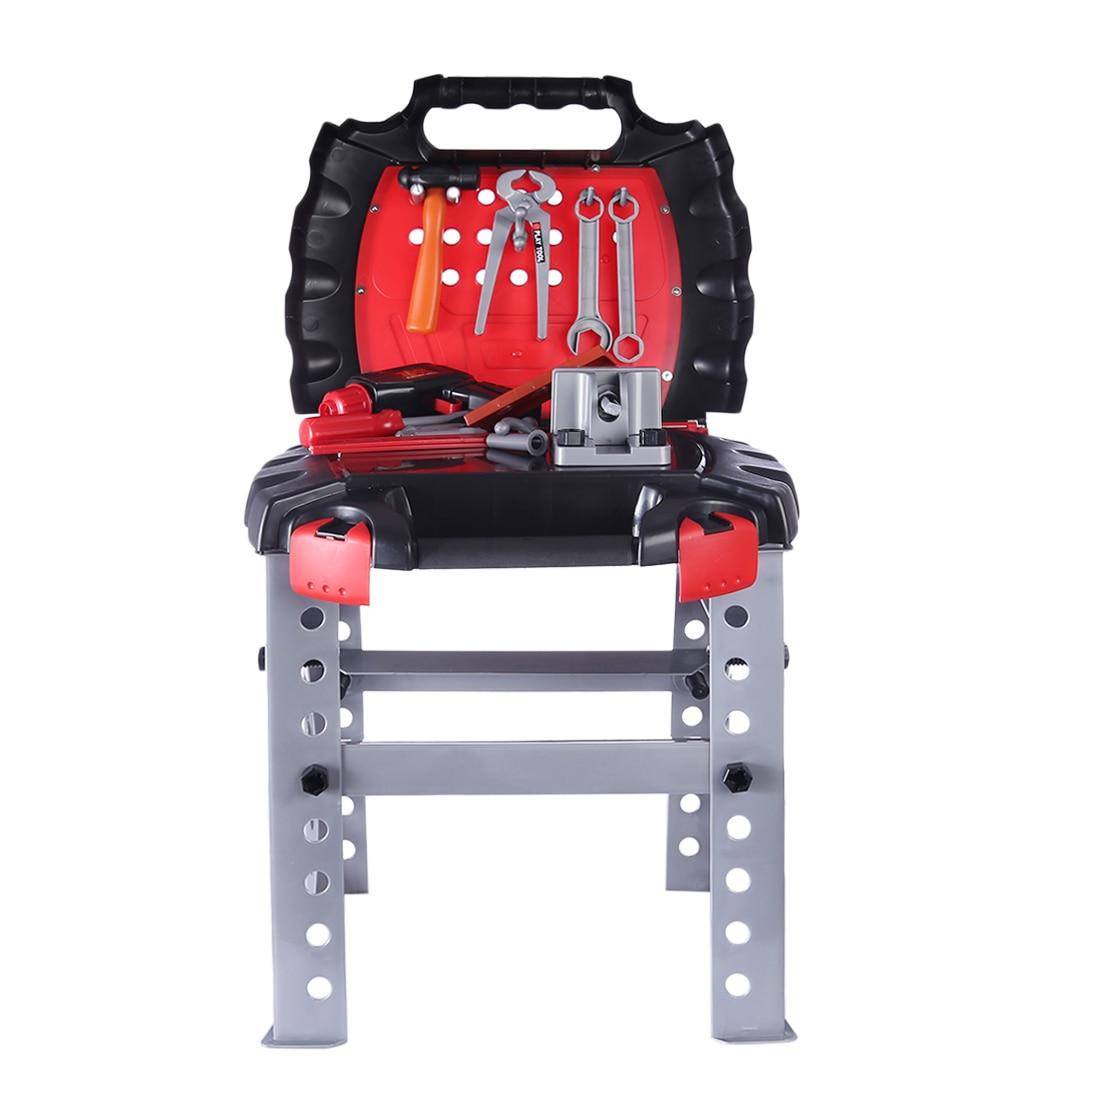 цены на Surwish 44Pcs Children Pretend Play Toys Electric Tool Set Educational Gift Set  в интернет-магазинах